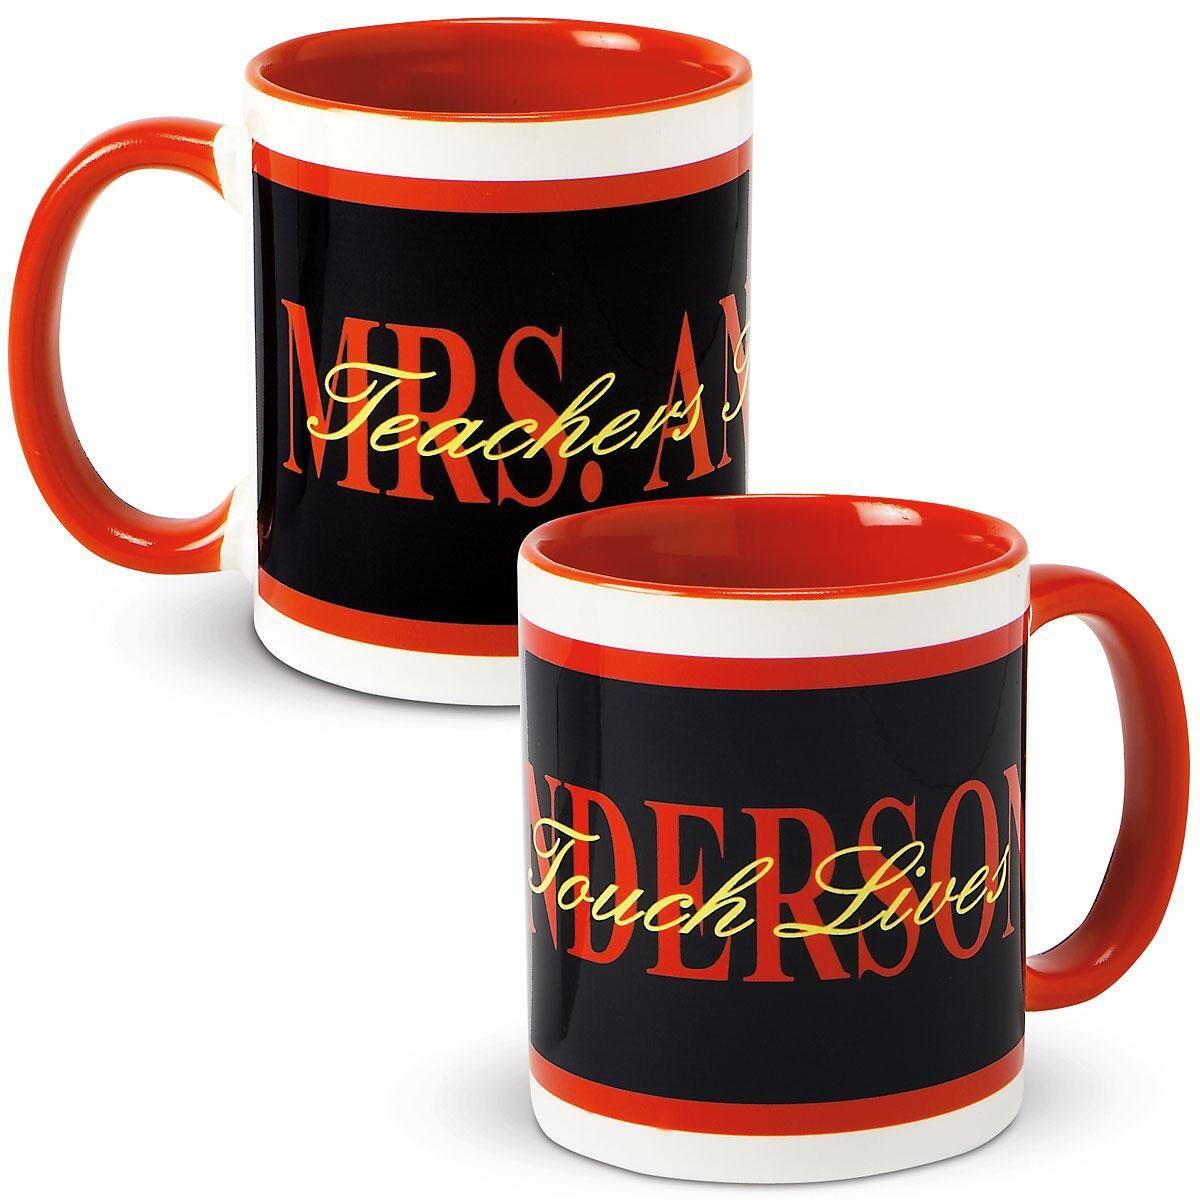 Teacher's Personalized Mug